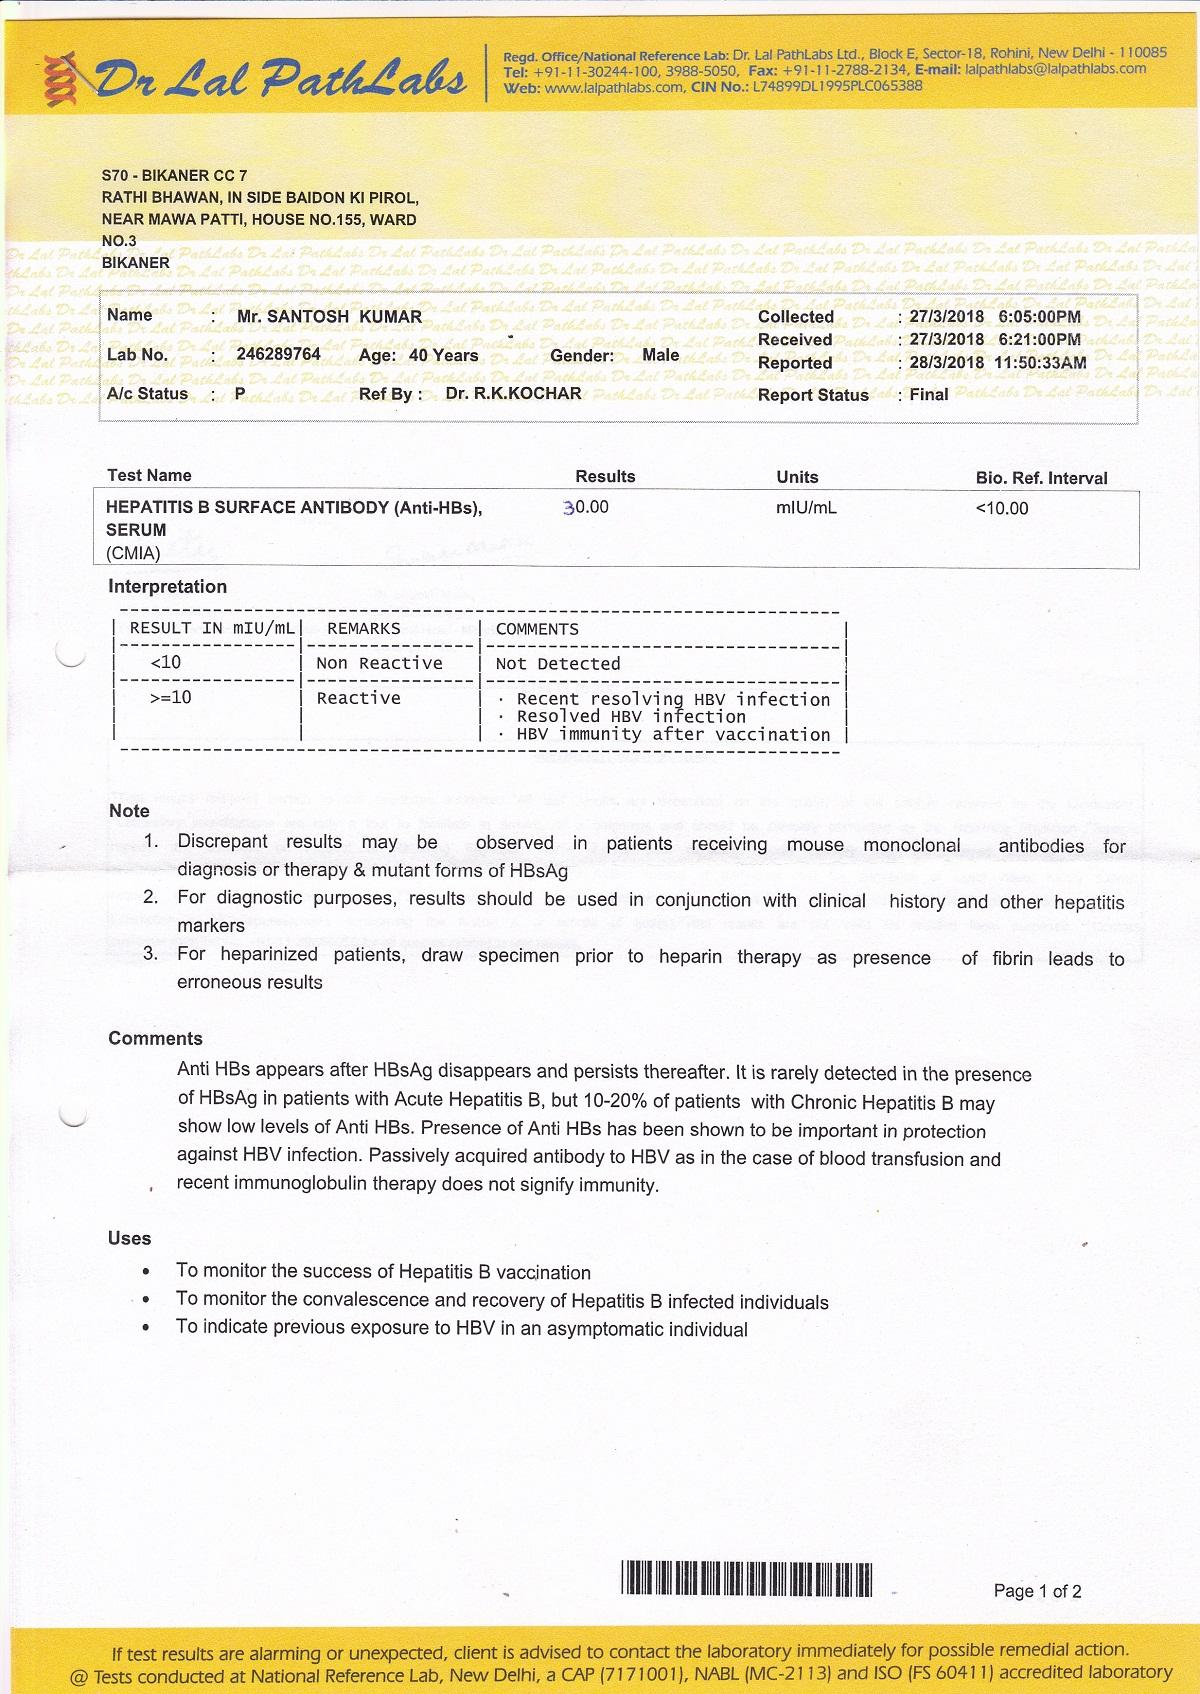 Santosh-kumar-40yrs-Hepatitis-B-Treatment-1